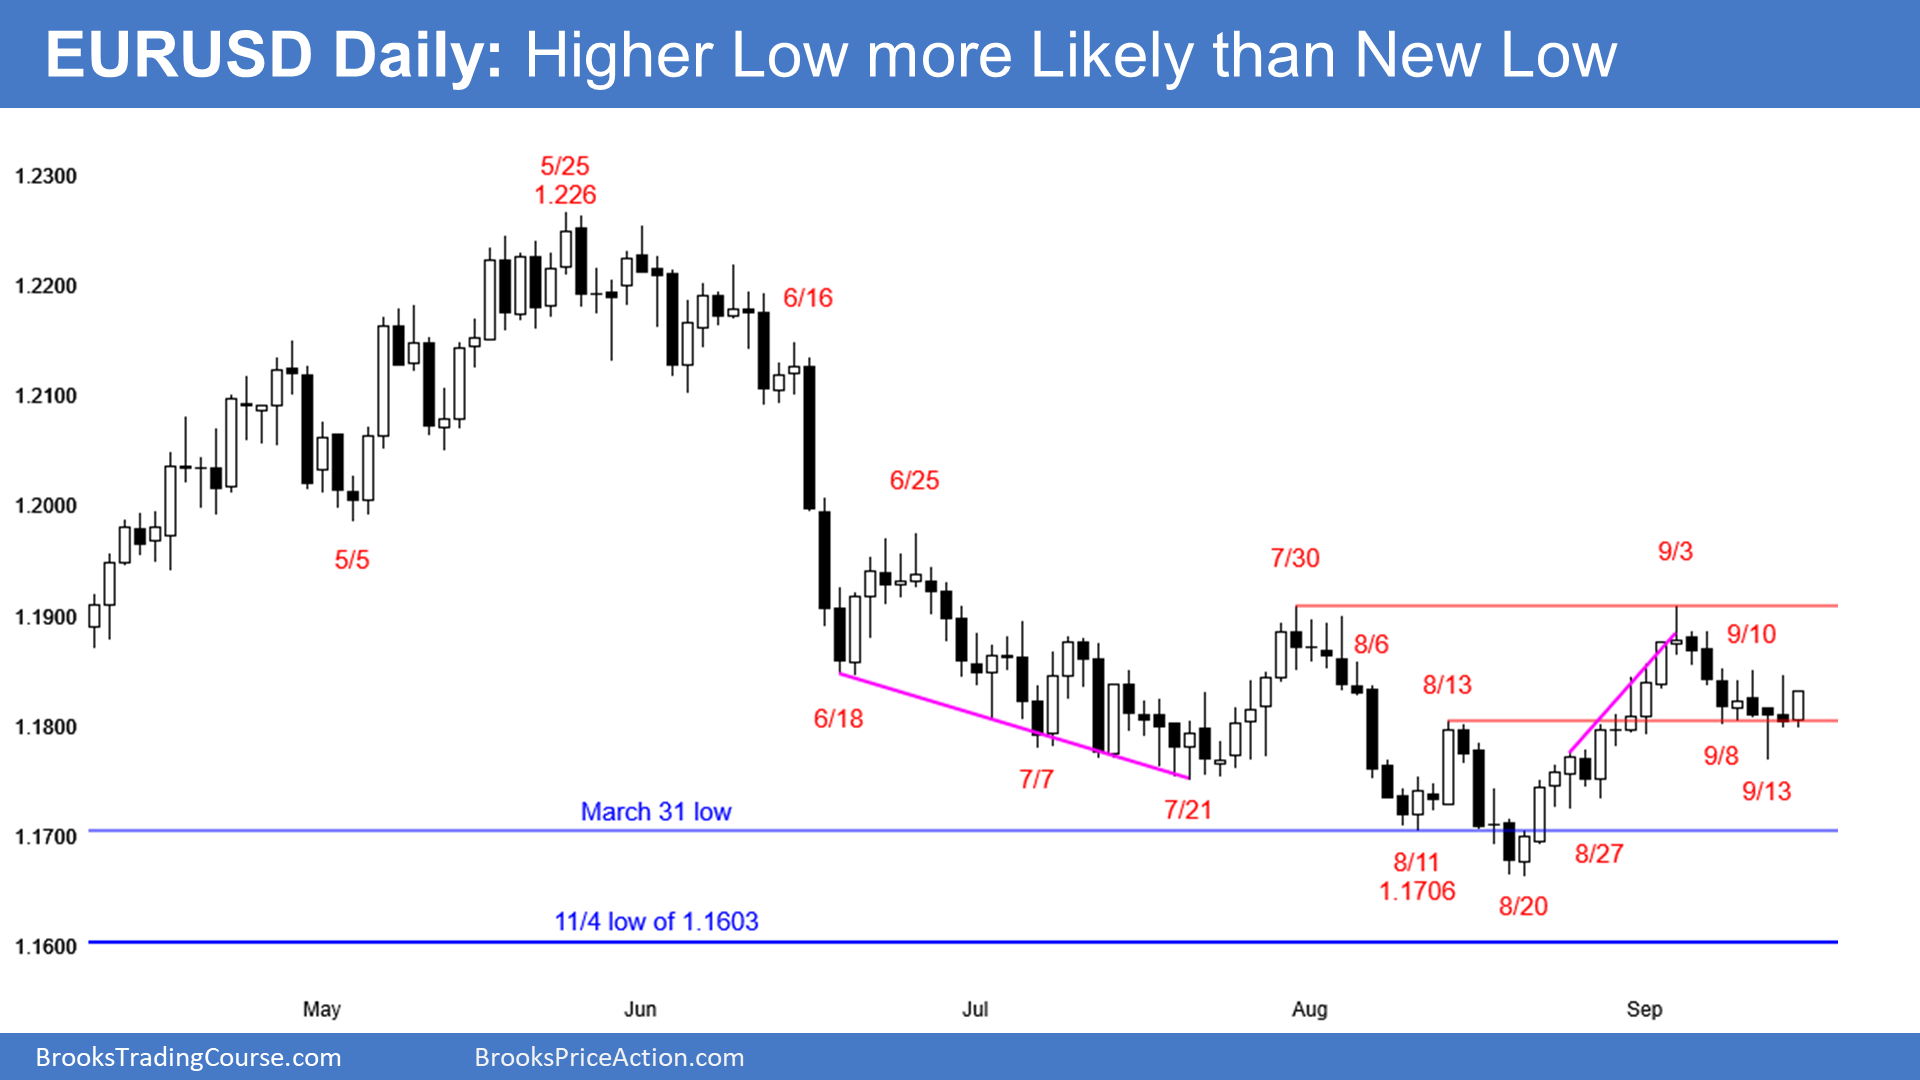 EUR/USD: Tight Trading Range | Investing.com